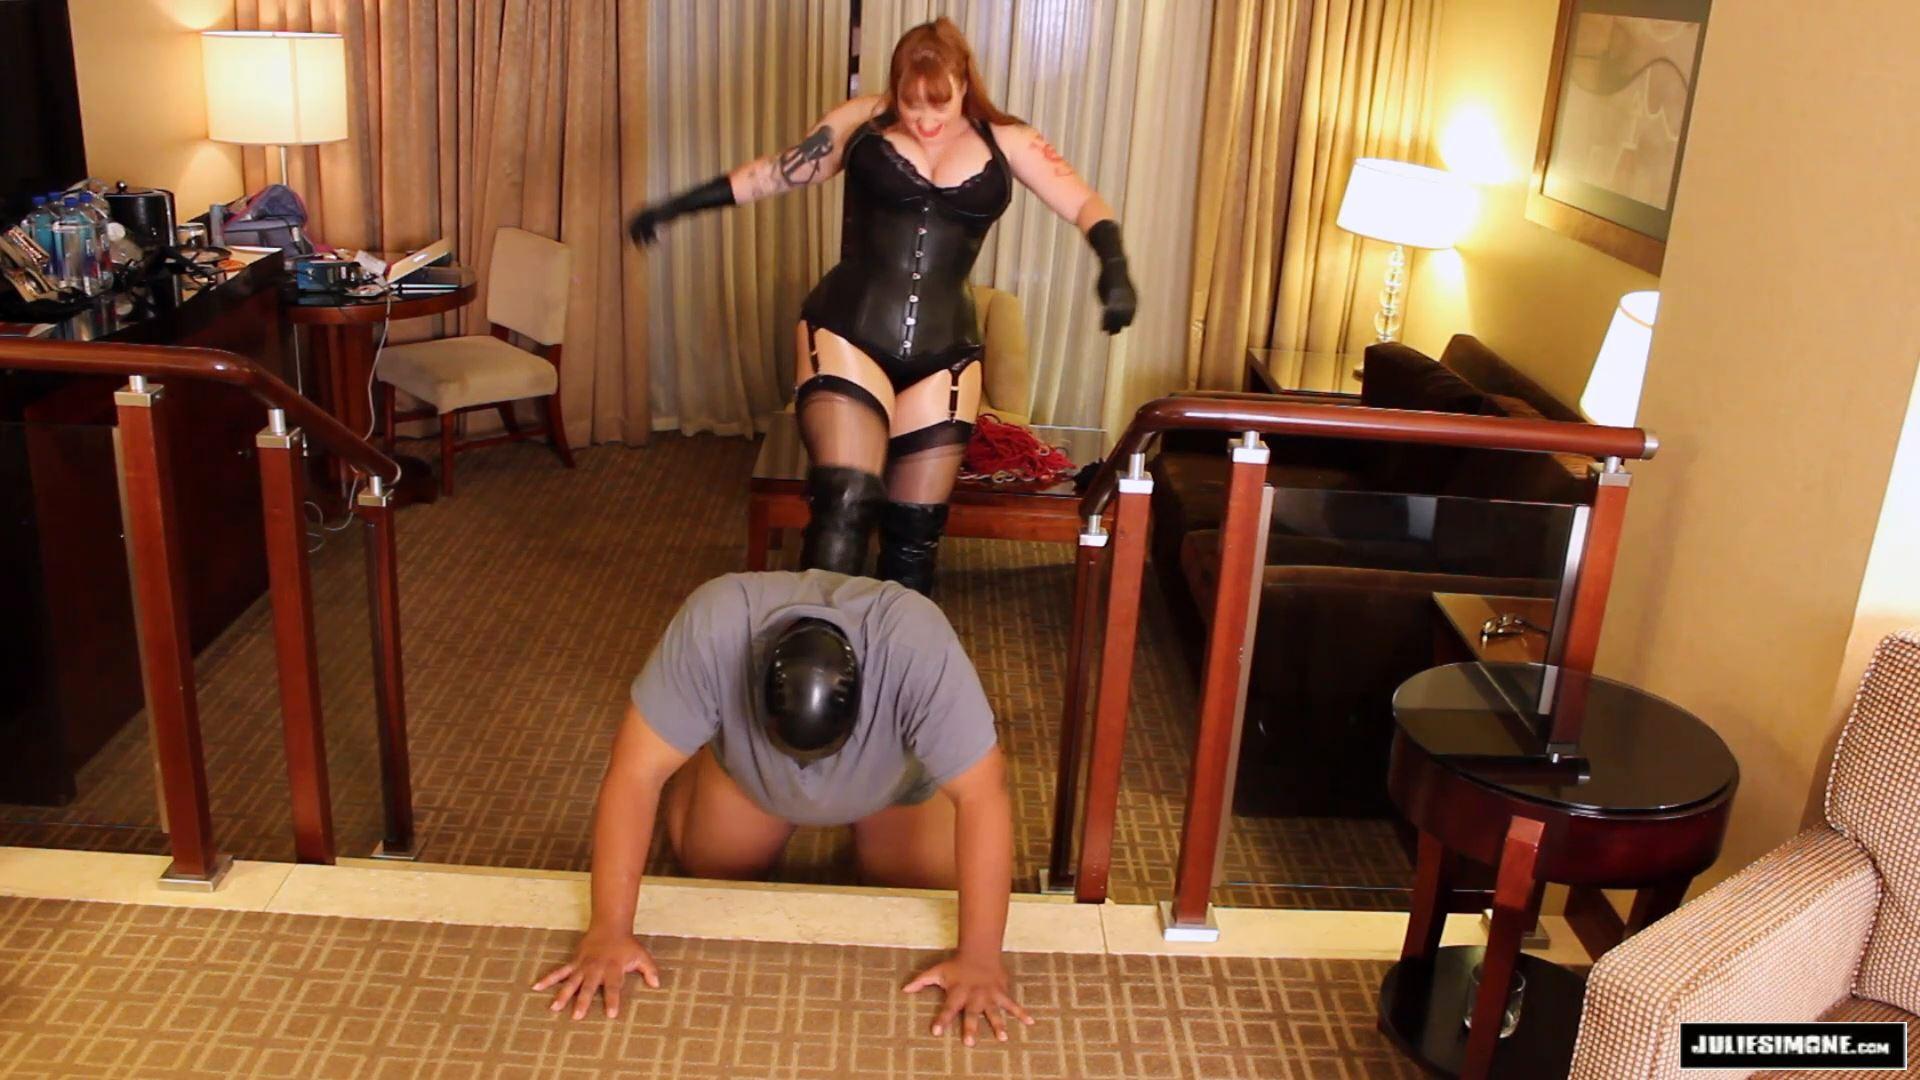 Julie Simone In Scene: Ballbusting Leather Boots w Stockings - JULIESIMONE - FULL HD/1080p/MP4